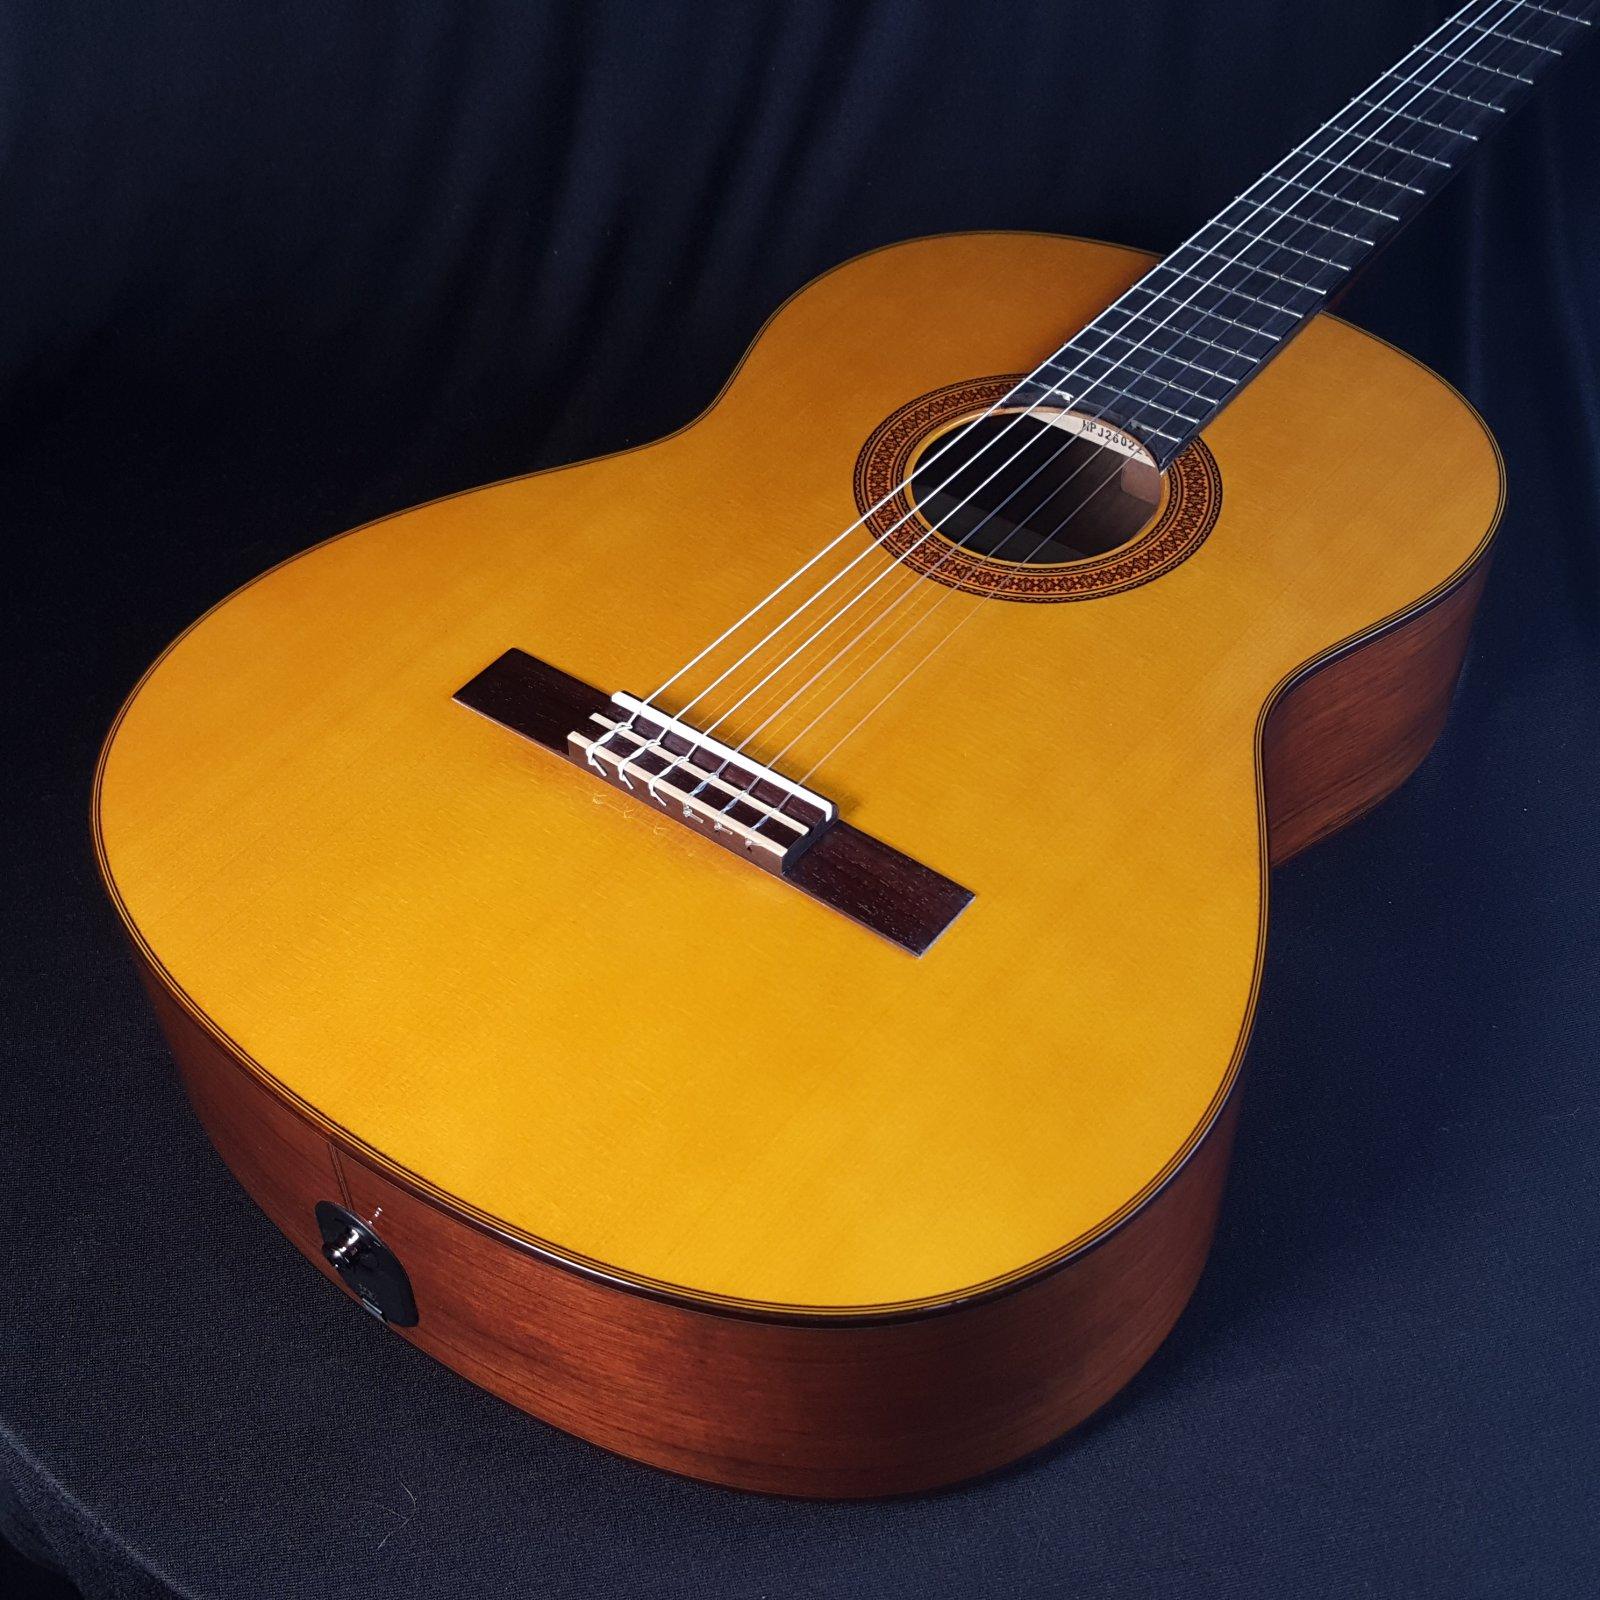 YAMAHA CG-TA VT TransAcoustic Classical Nylon String Guitar